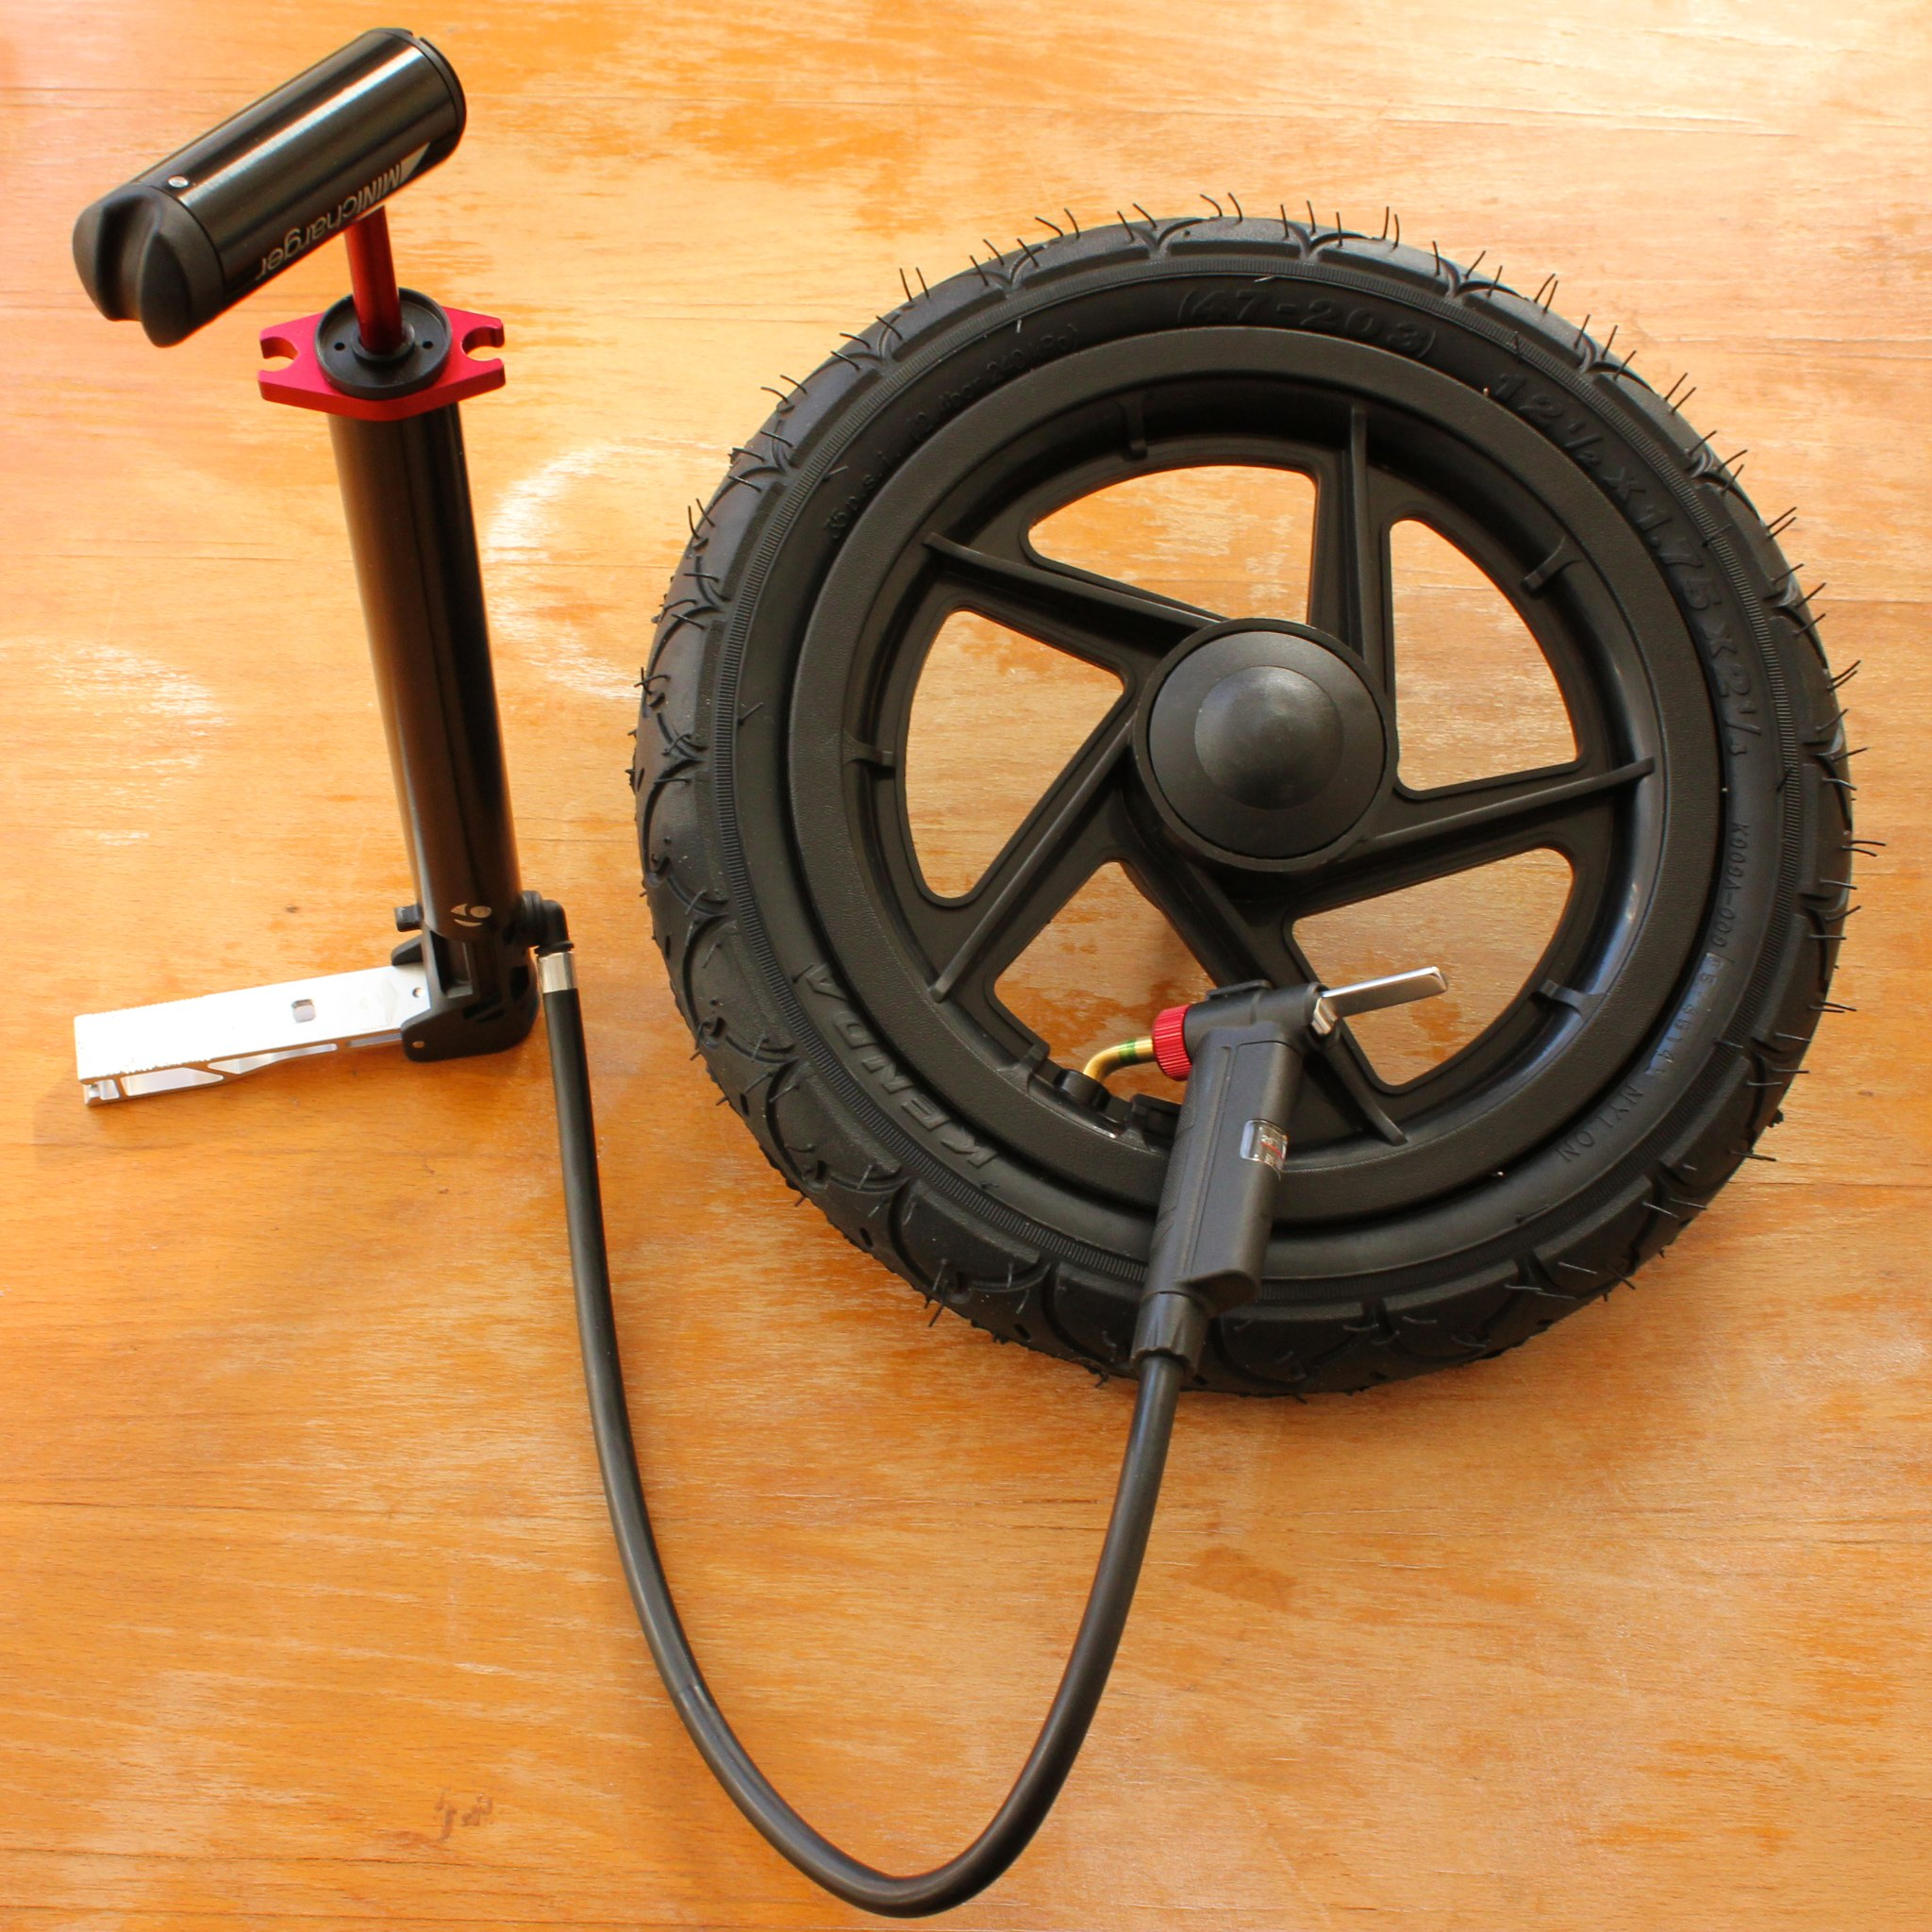 Bontrager Flash Charger Flashcharger Pump Review - Love It ...